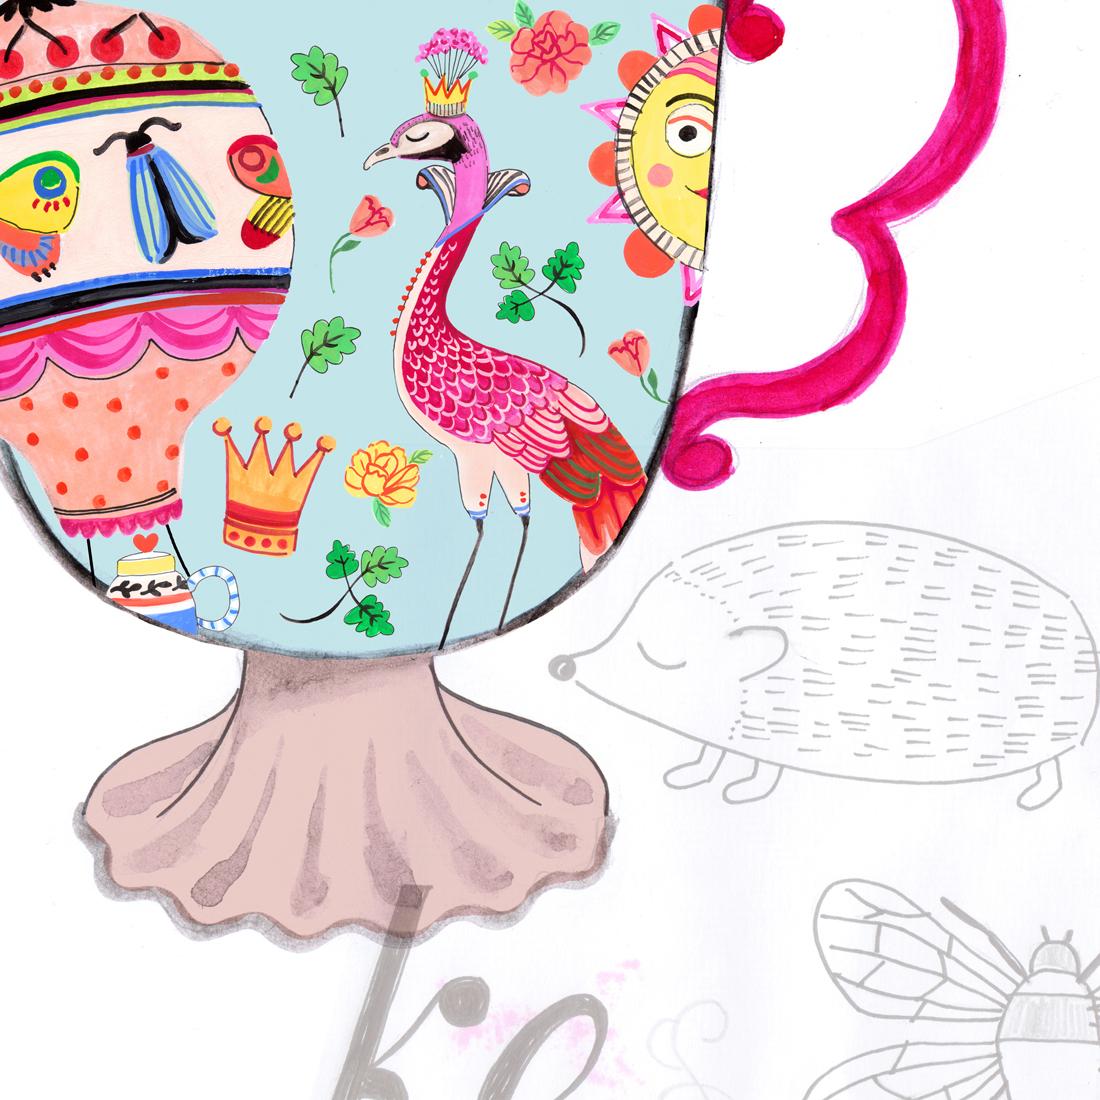 Global-Talent-Search-2016-7-emmajayne-designs